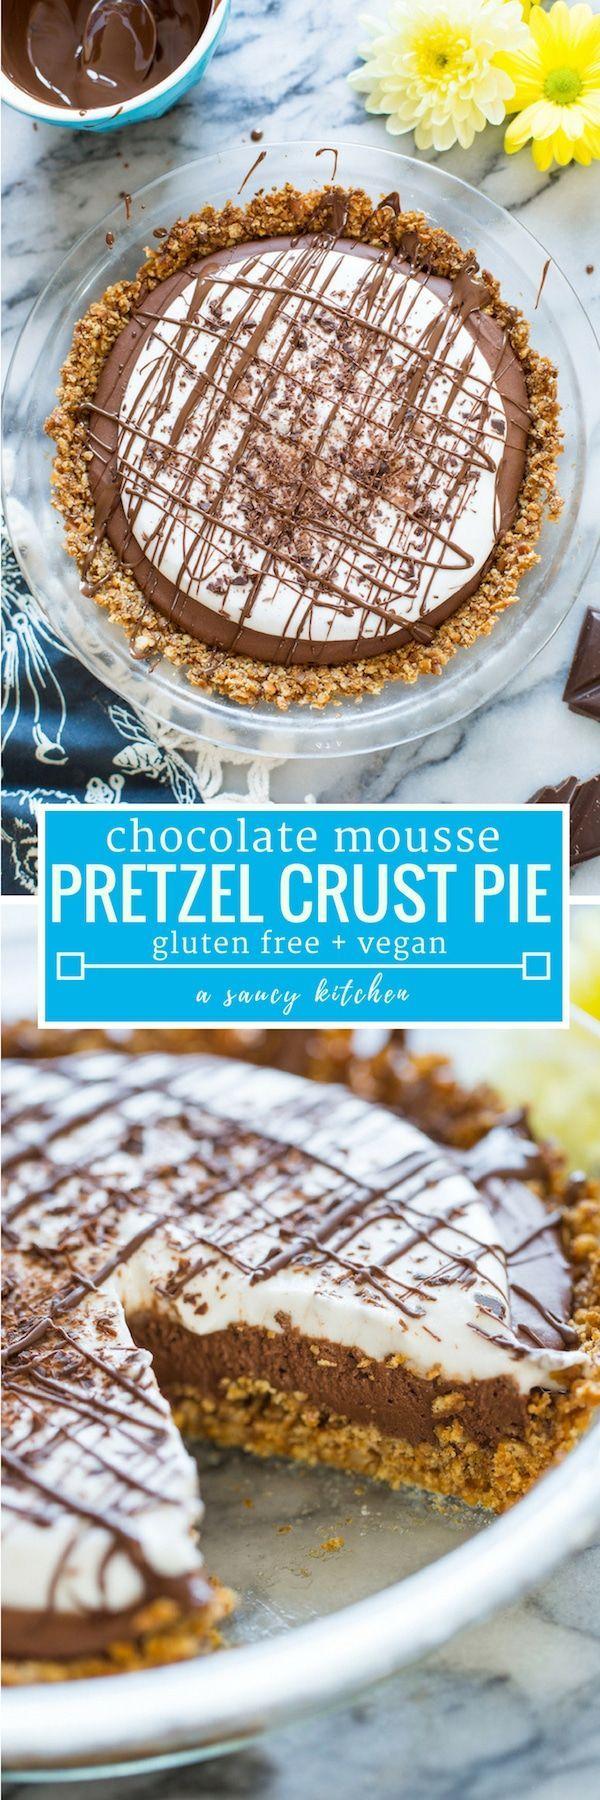 1692 best Dessert Recipes! images on Pinterest | Afternoon snacks ...